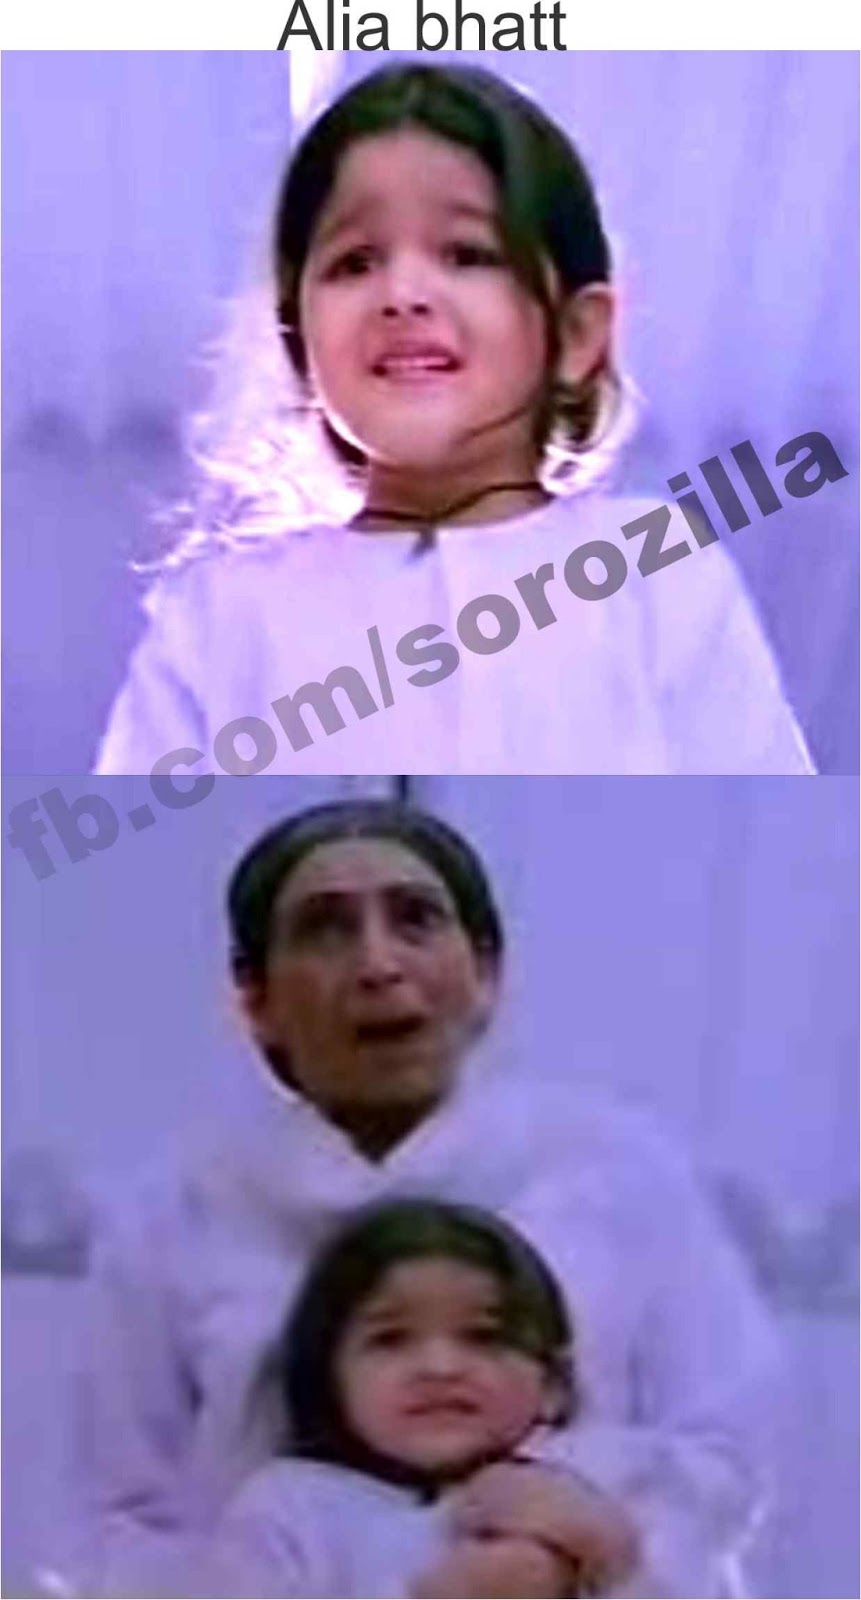 alia bhatt in movie sangharsh photos sorozilla